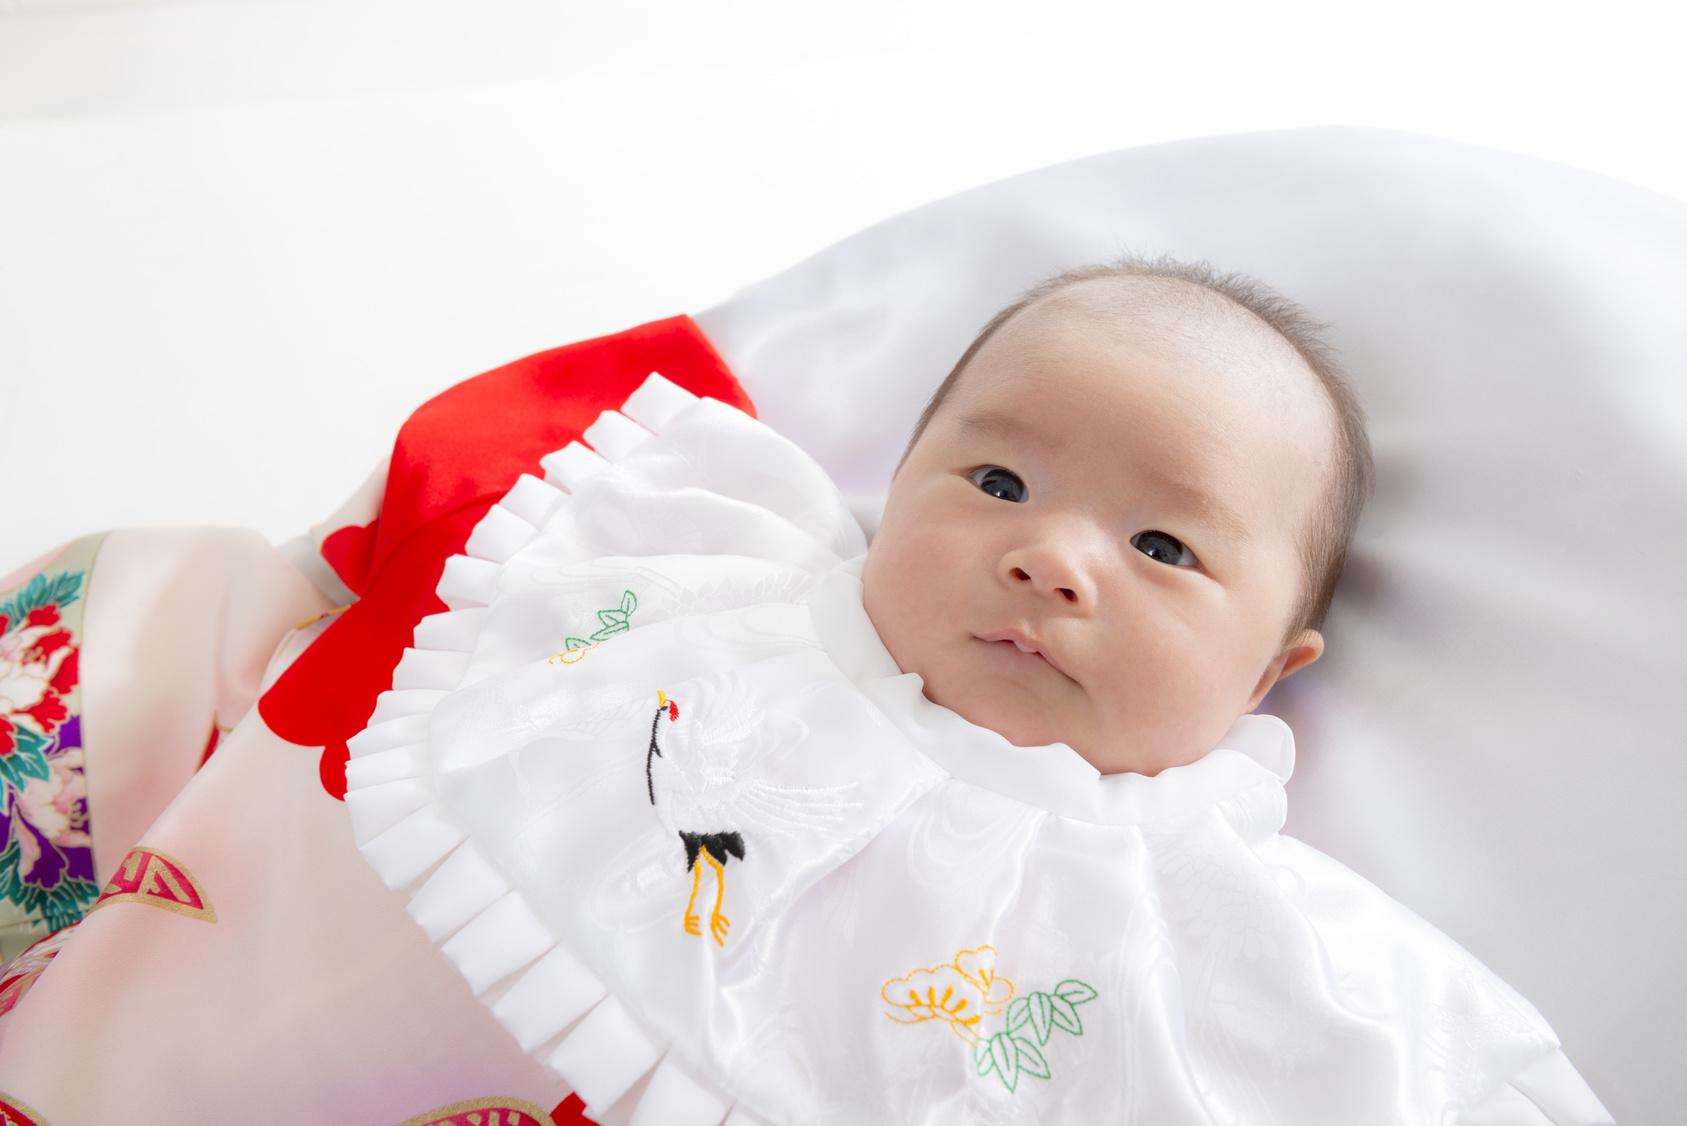 525bb41617197 赤ちゃん・子どものお祝い事!出産から成人式までの行事まとめ|暮らしの ...